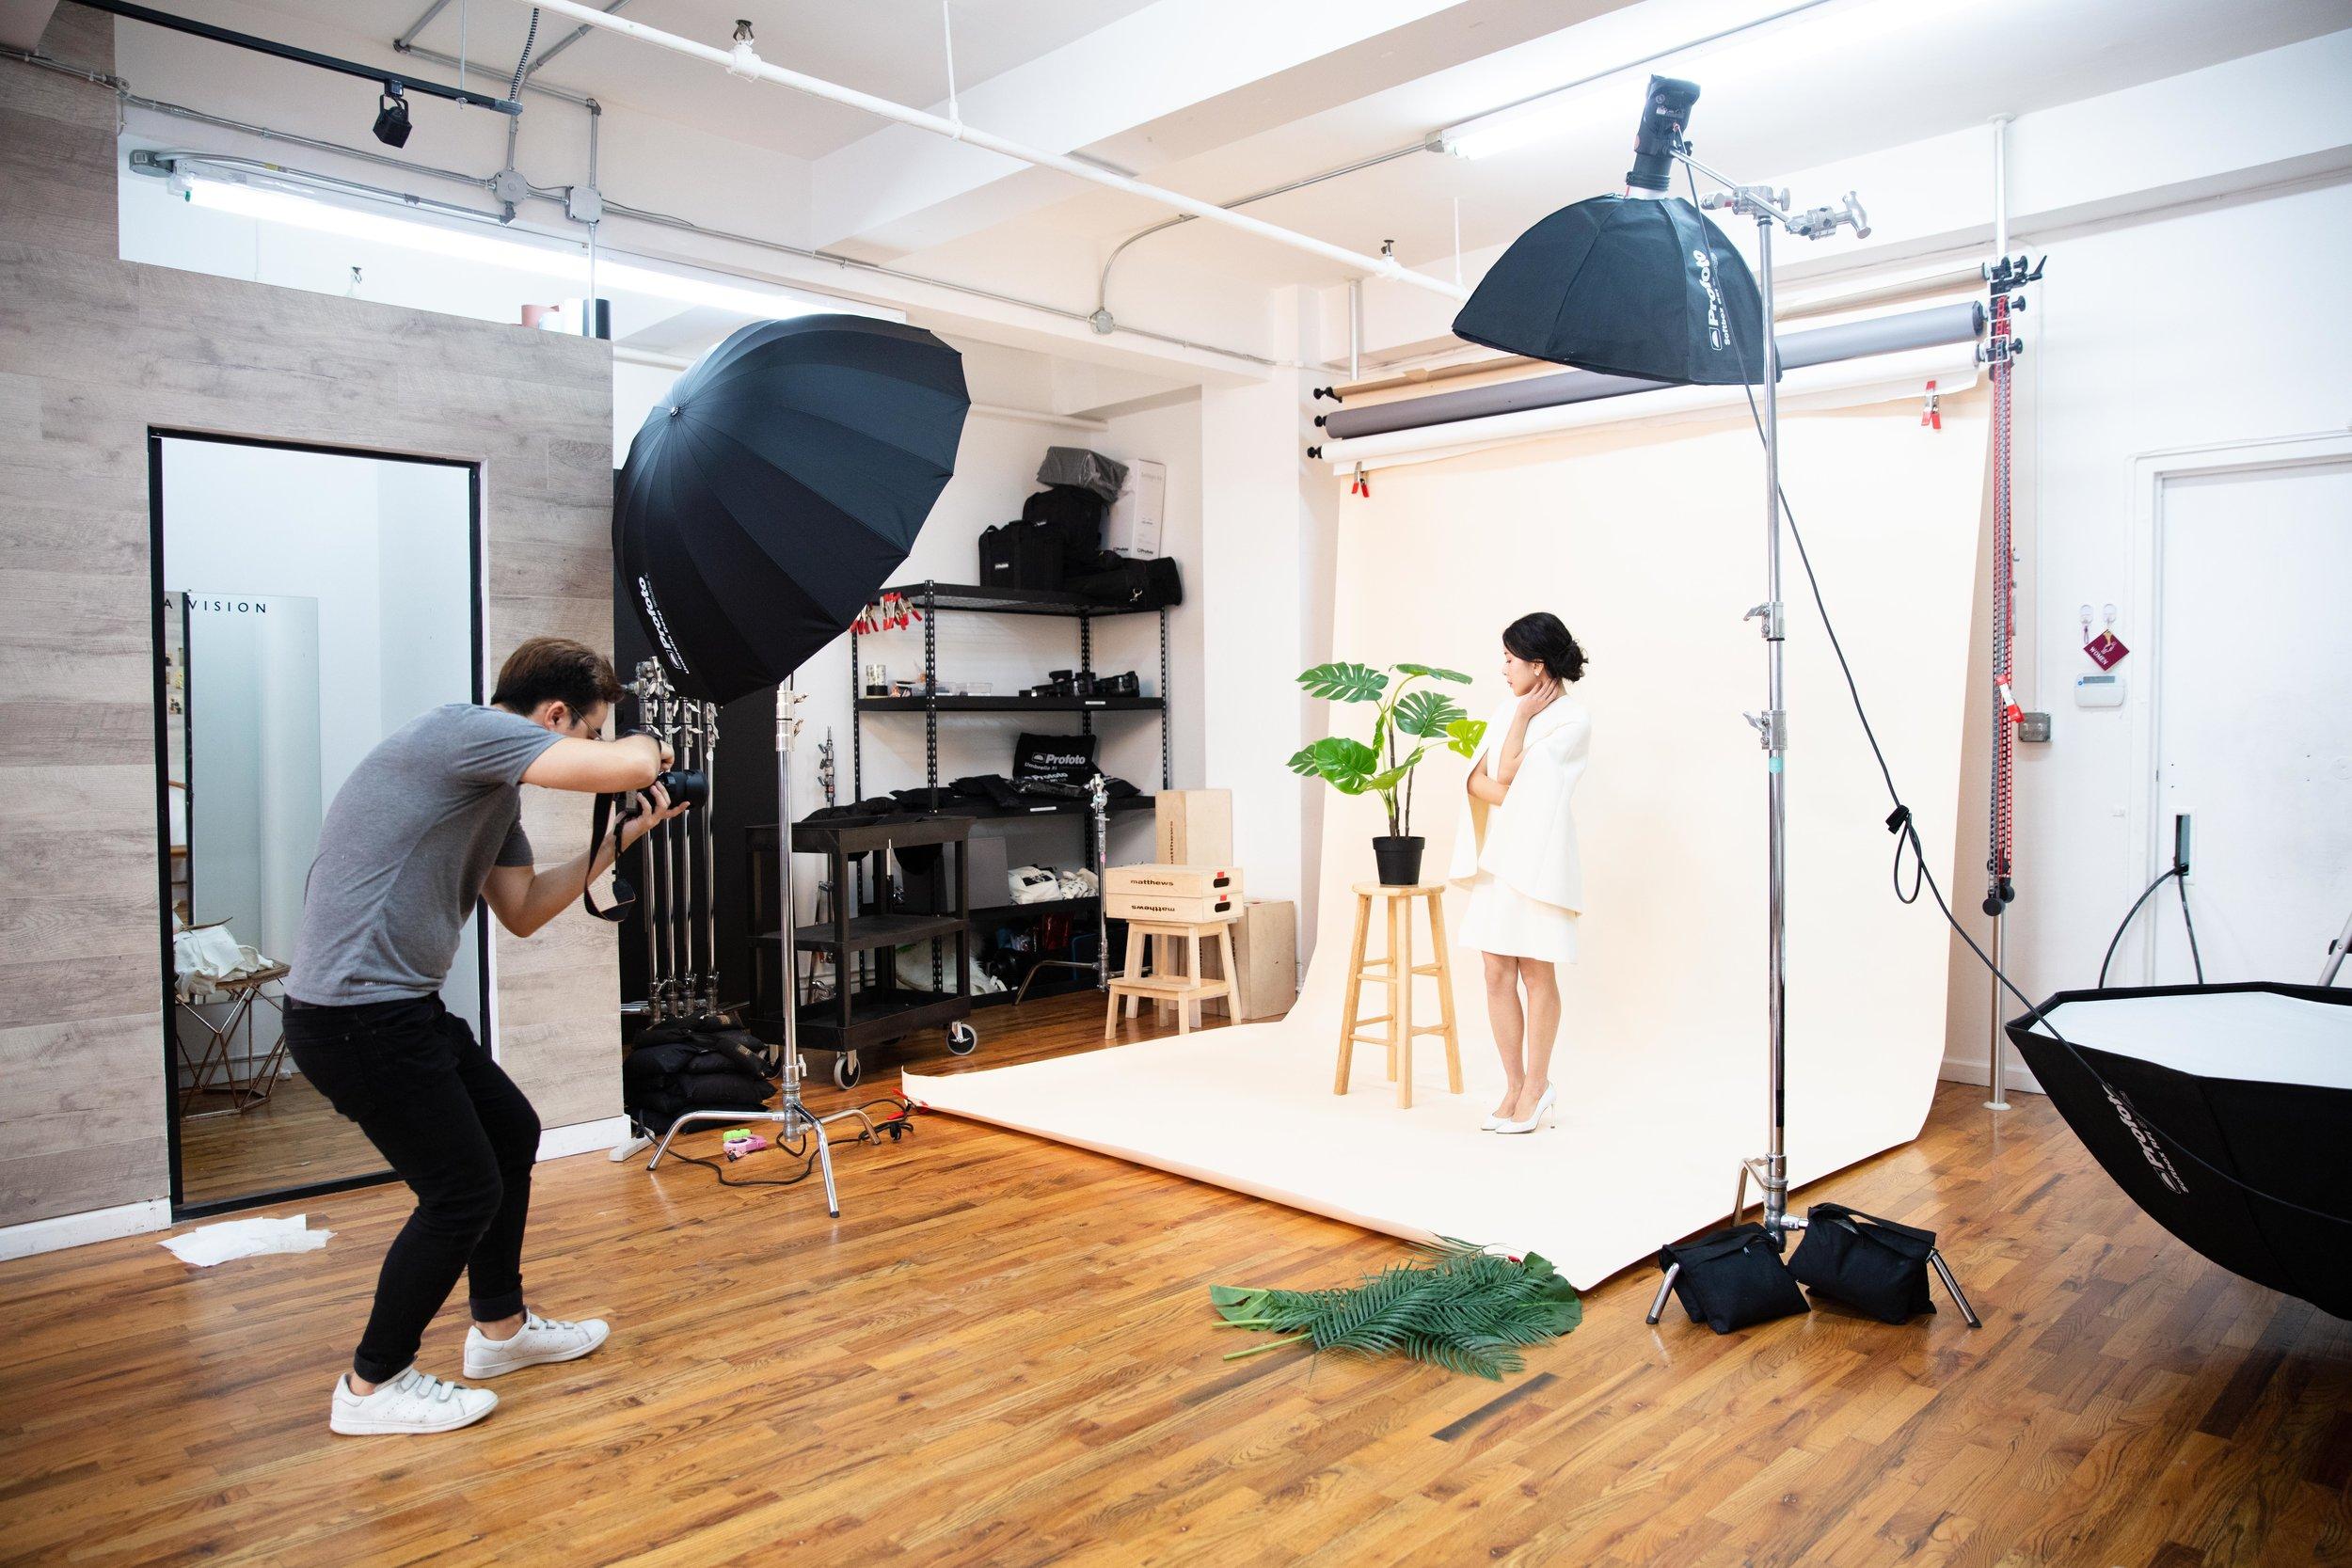 STUDIO RENTAL - $90/Hr | Entire Studio | Lighting & Grip EQ$50/Hr | Meeting Room$50/Hr | Same day Walk-In | Entire Studio | Lighting & Grip EQ